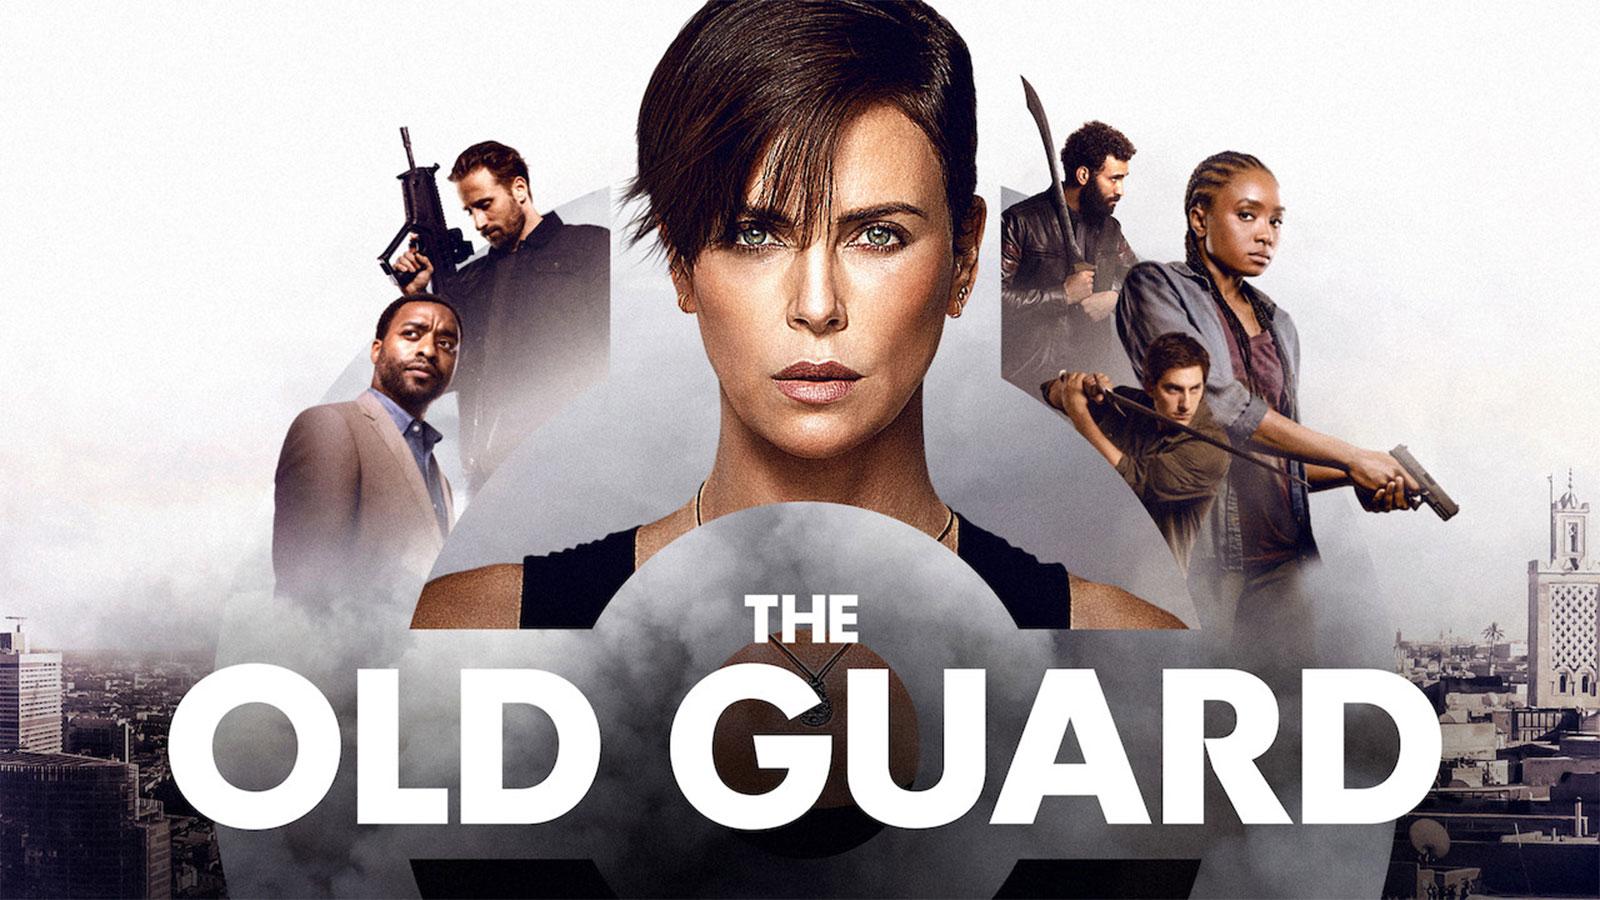 پشت صحنه فیلم The Old Guard